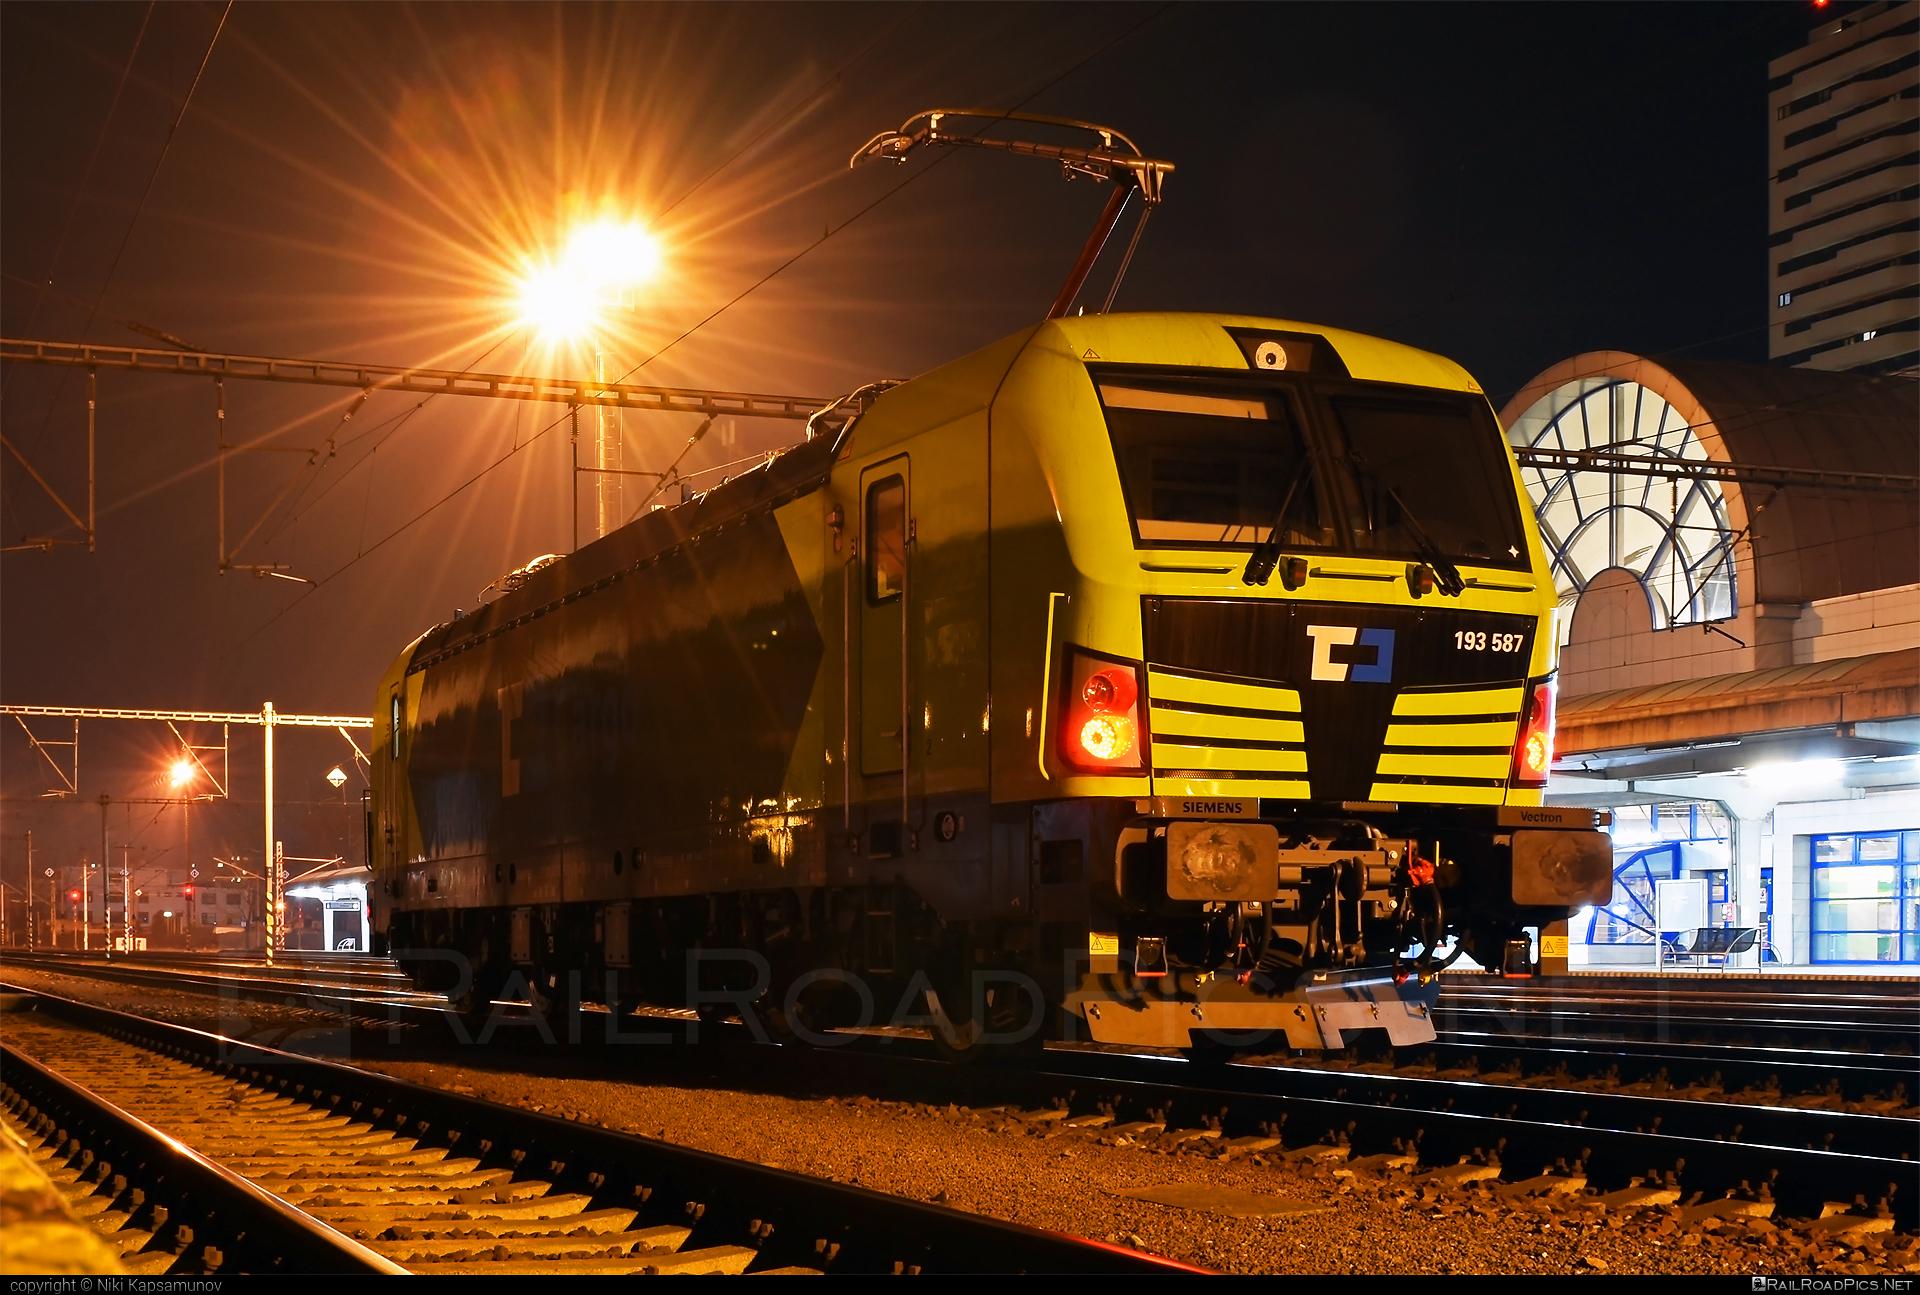 Siemens Vectron MS - 193 587 operated by ČD Cargo, a.s. #alphatrainsluxembourg #cdcargo #siemens #siemensvectron #siemensvectronms #vectron #vectronms